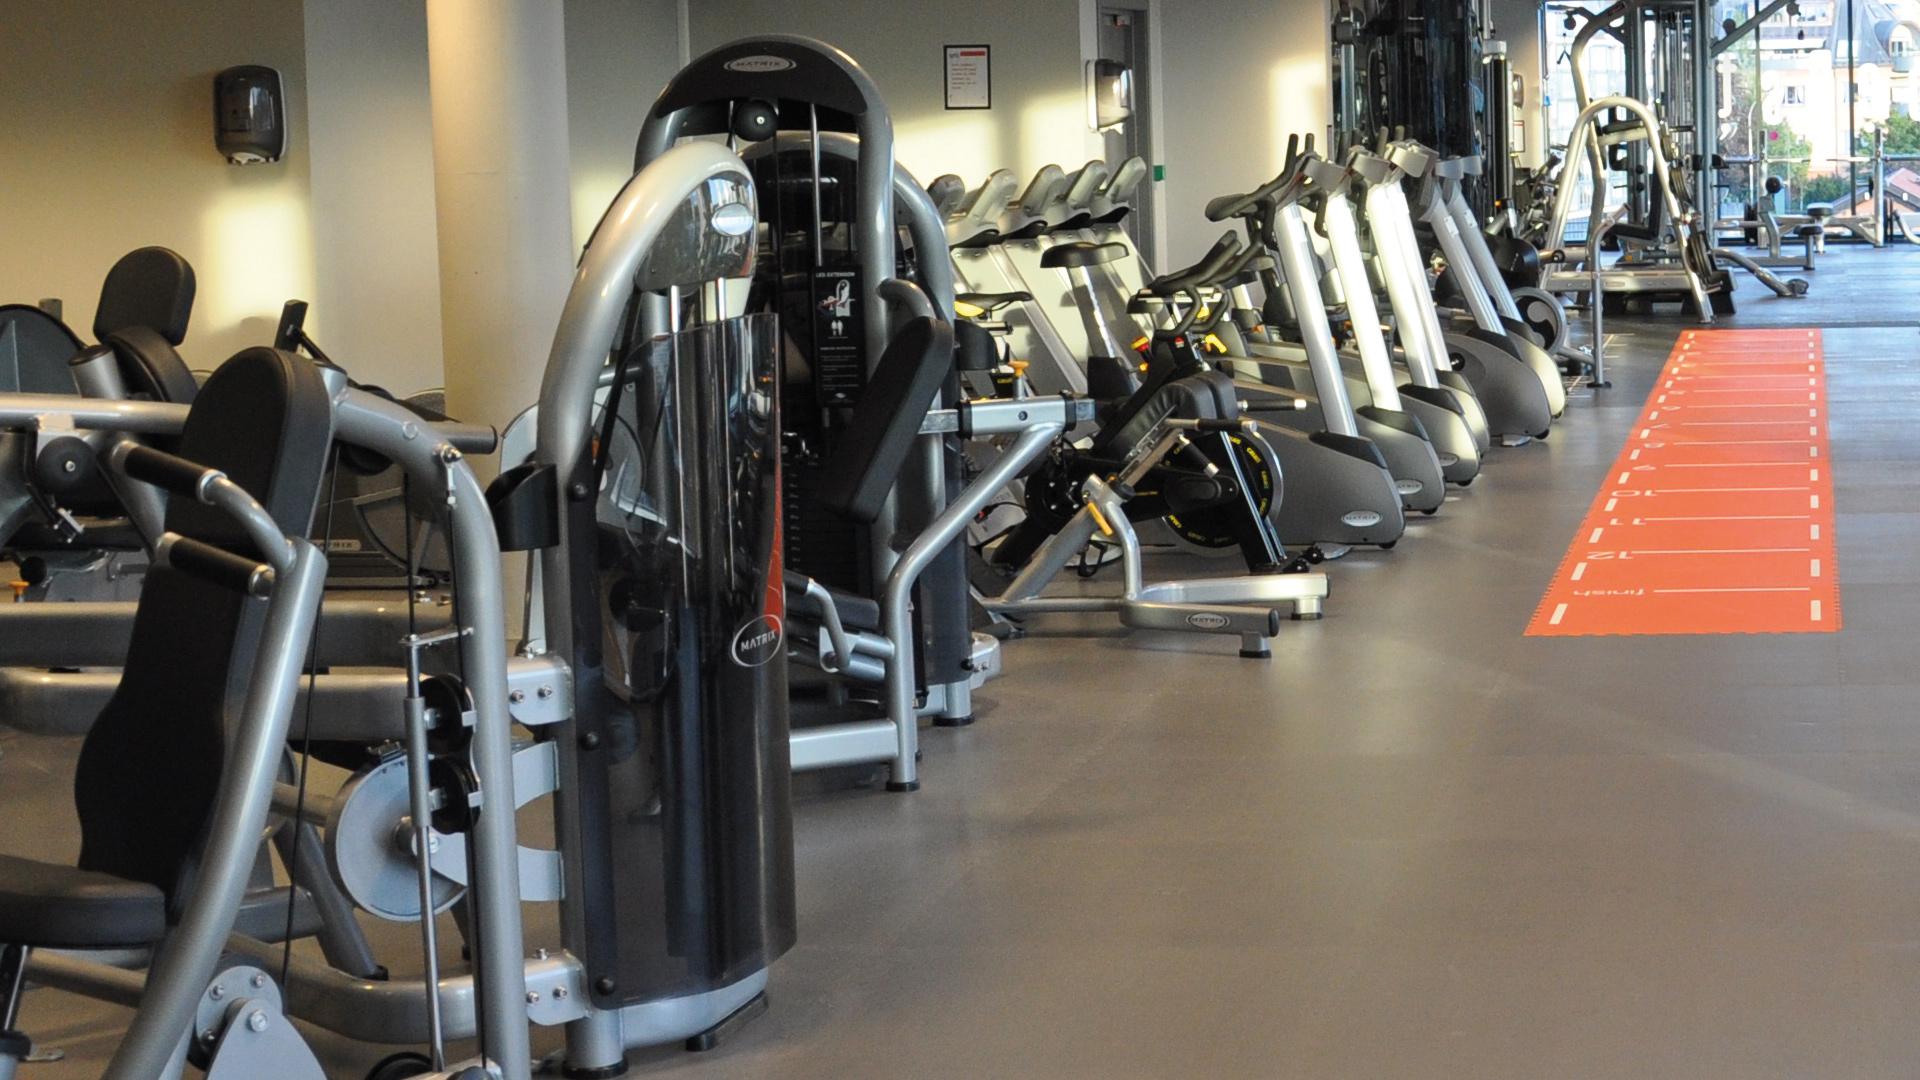 InTraining Gym (Photo: MusicPartner)